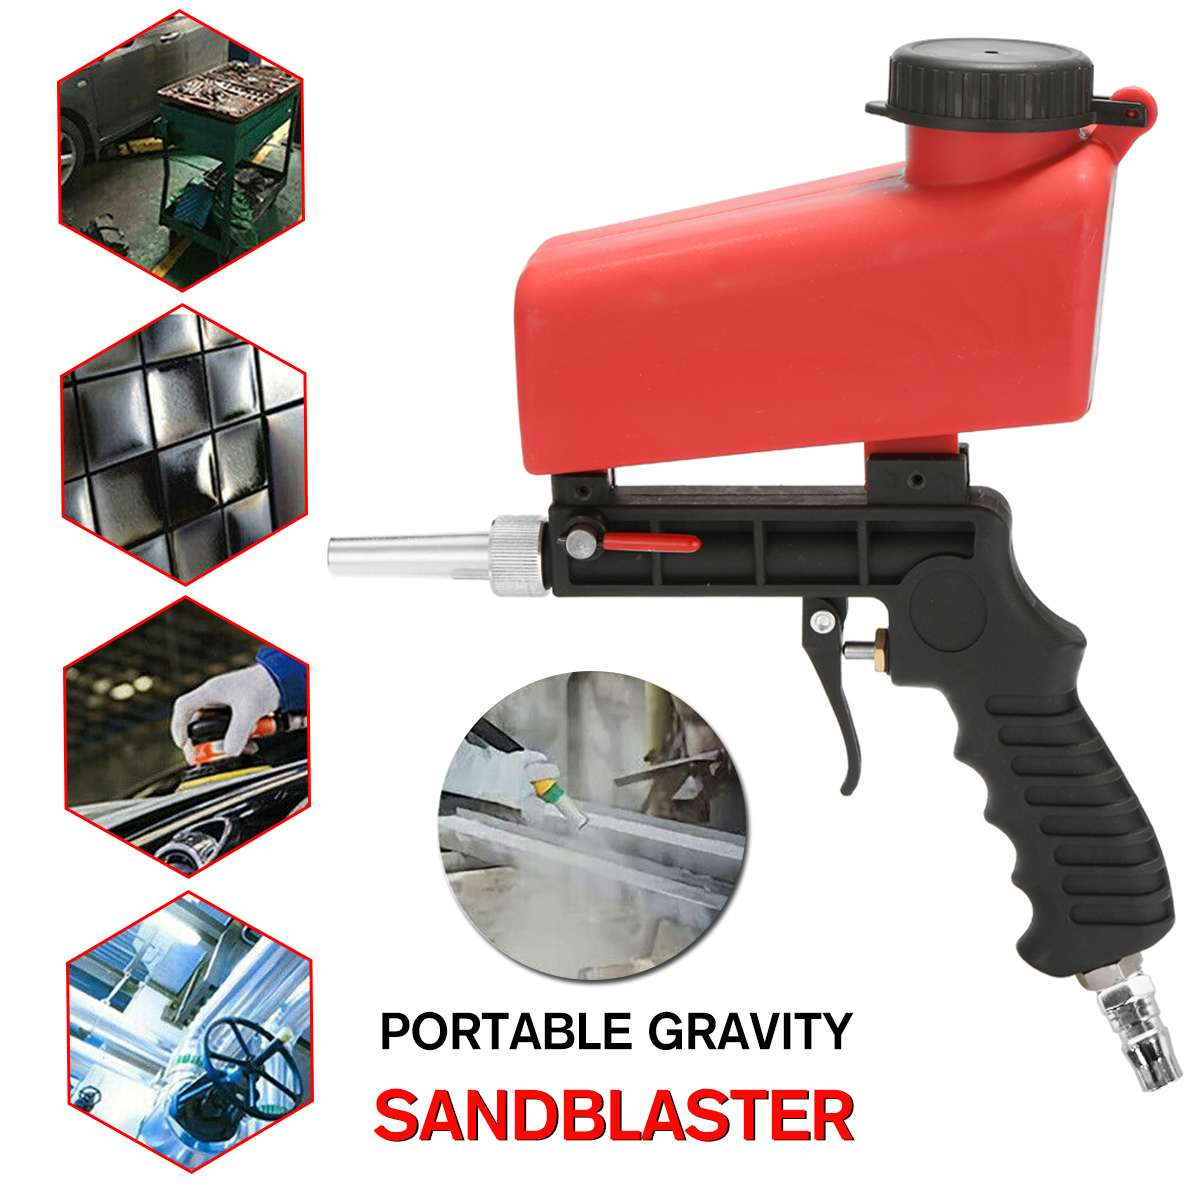 90psi Portable Gravity Sandblasting Guns Aluminium Pneumatic Sandblaster Spray Guns Sand Removal Blasting Power Machine